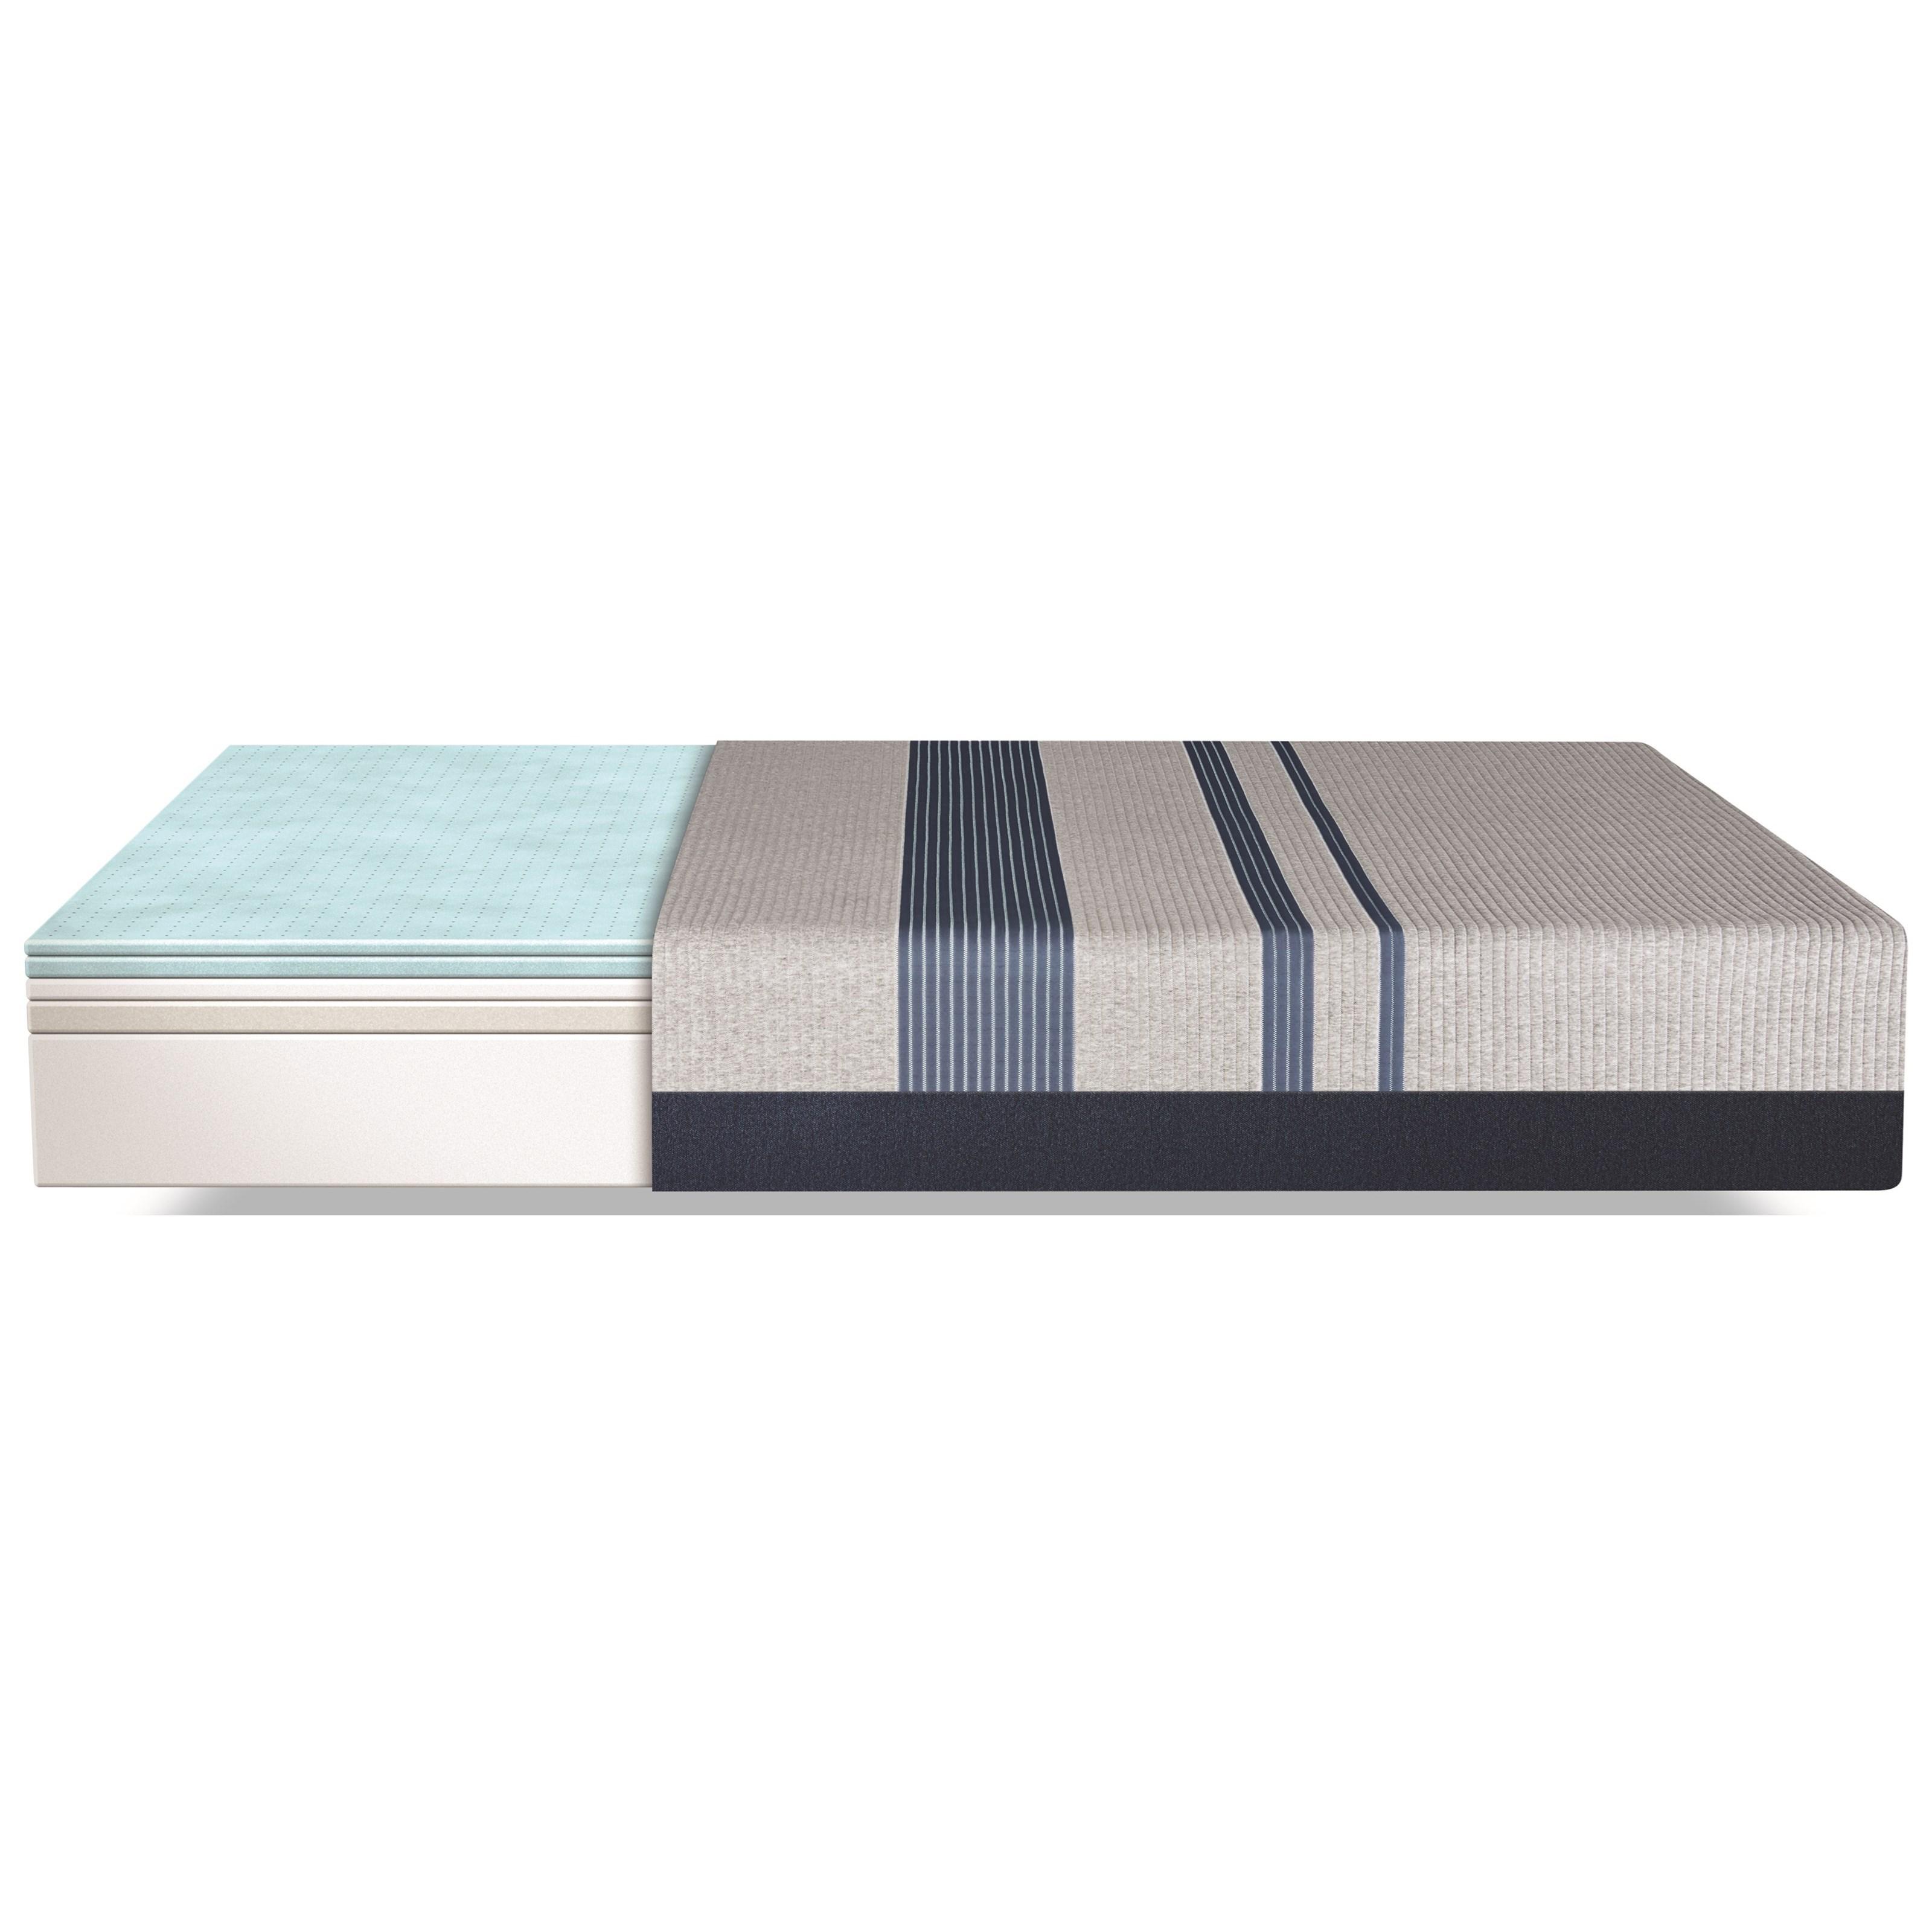 serta icomfort blue 300 firm 500801288 1050 500800199 5050 queen firm gel memory foam mattress. Black Bedroom Furniture Sets. Home Design Ideas